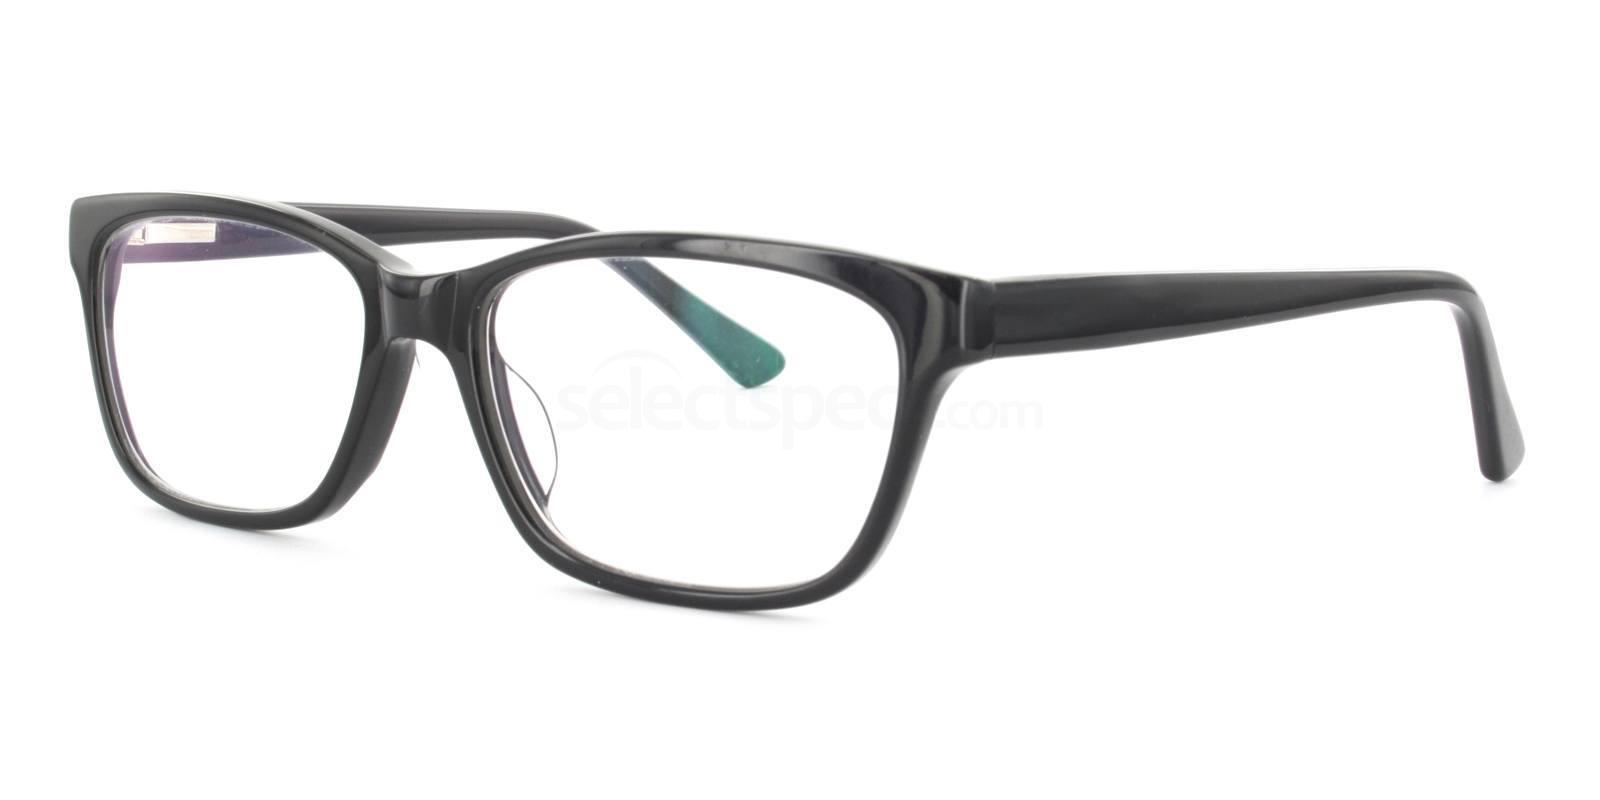 C1 A6668 Glasses, SelectSpecs